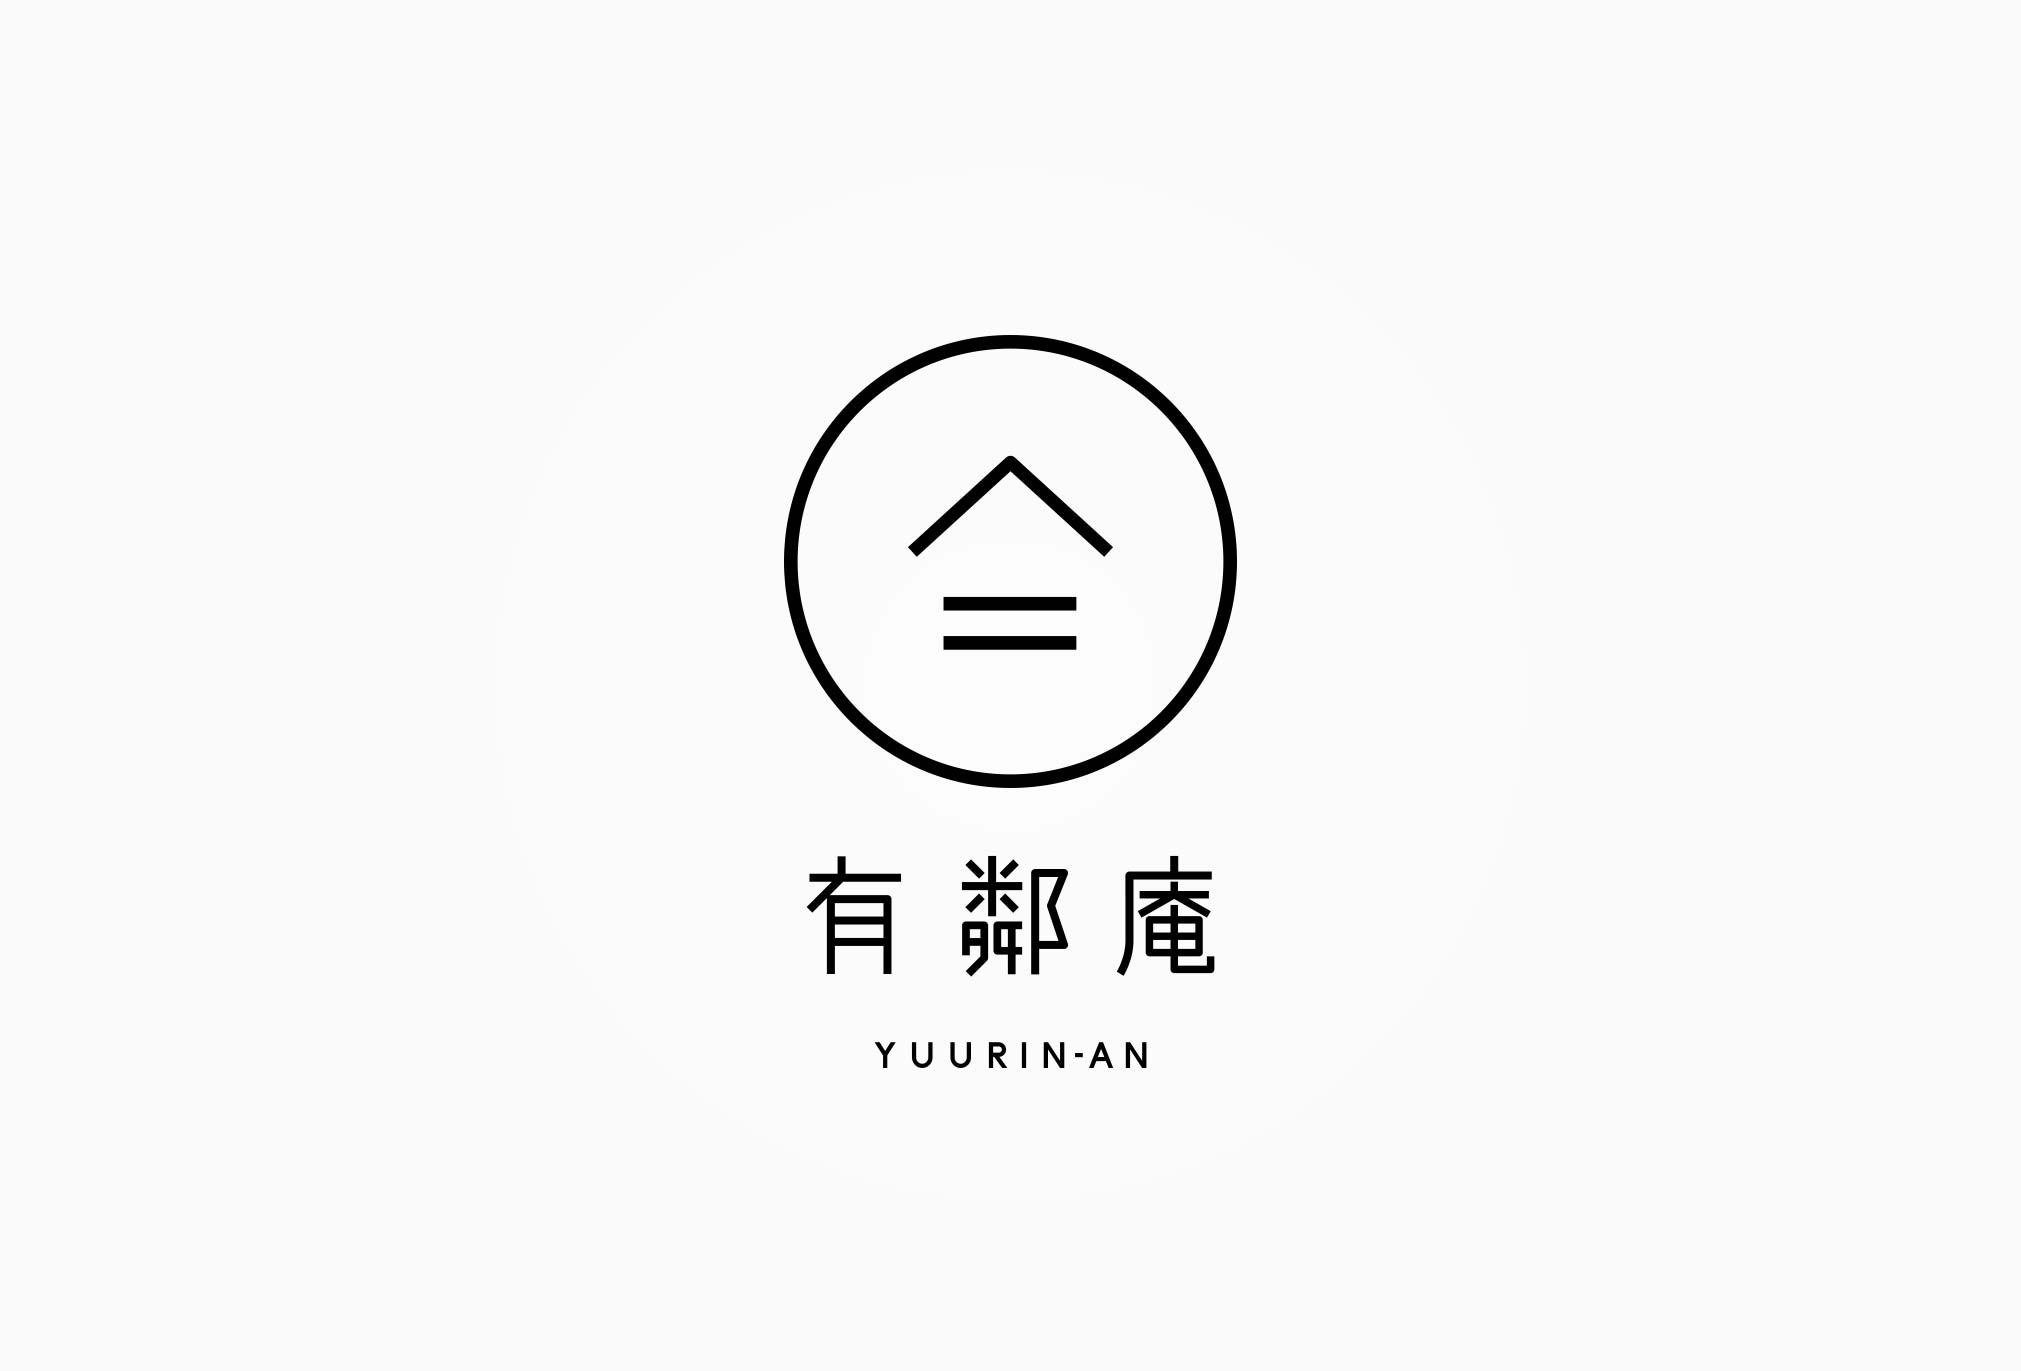 yuurin-an_logo1